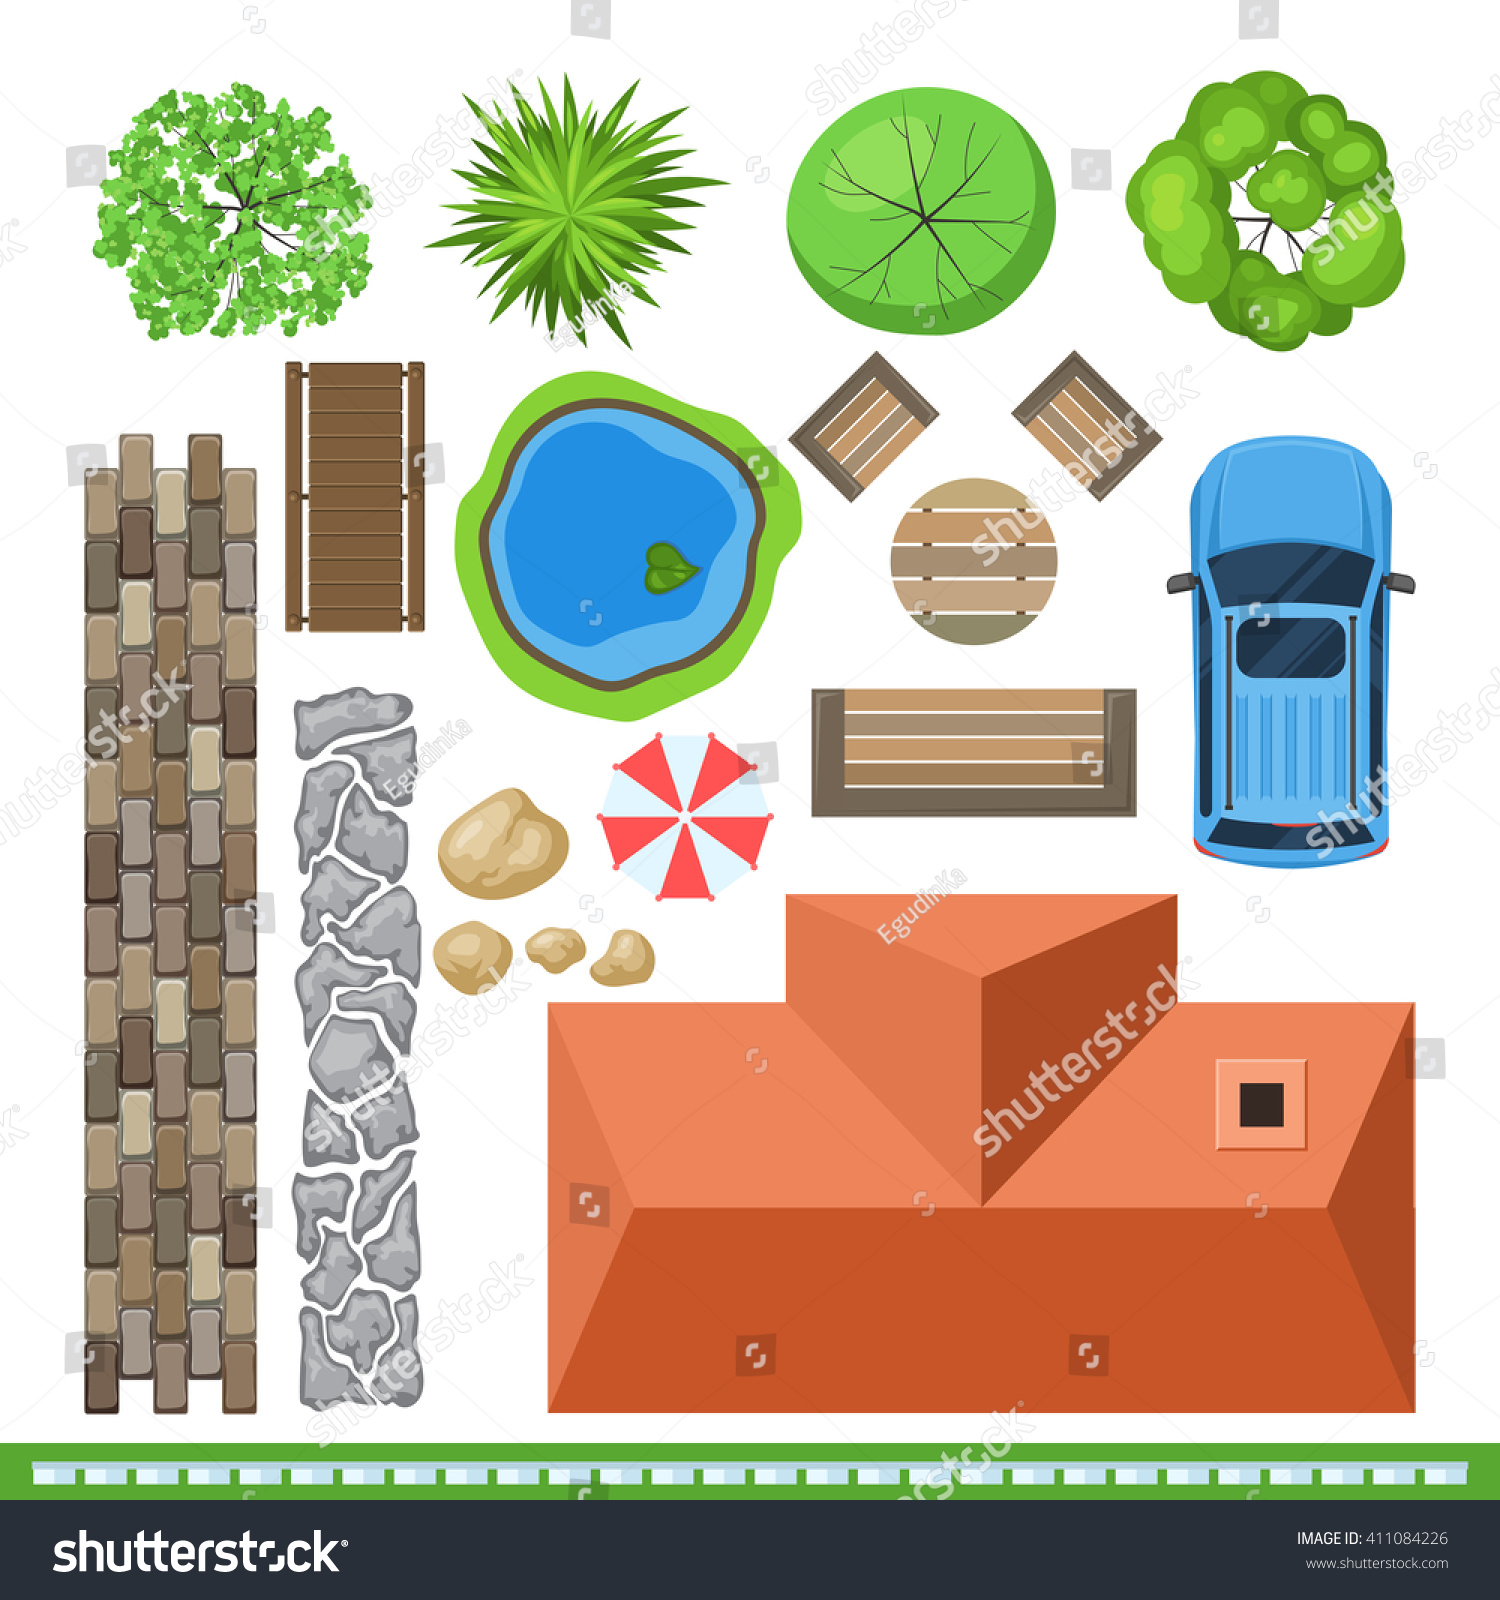 Landscape elements project design top view stock for Top view design